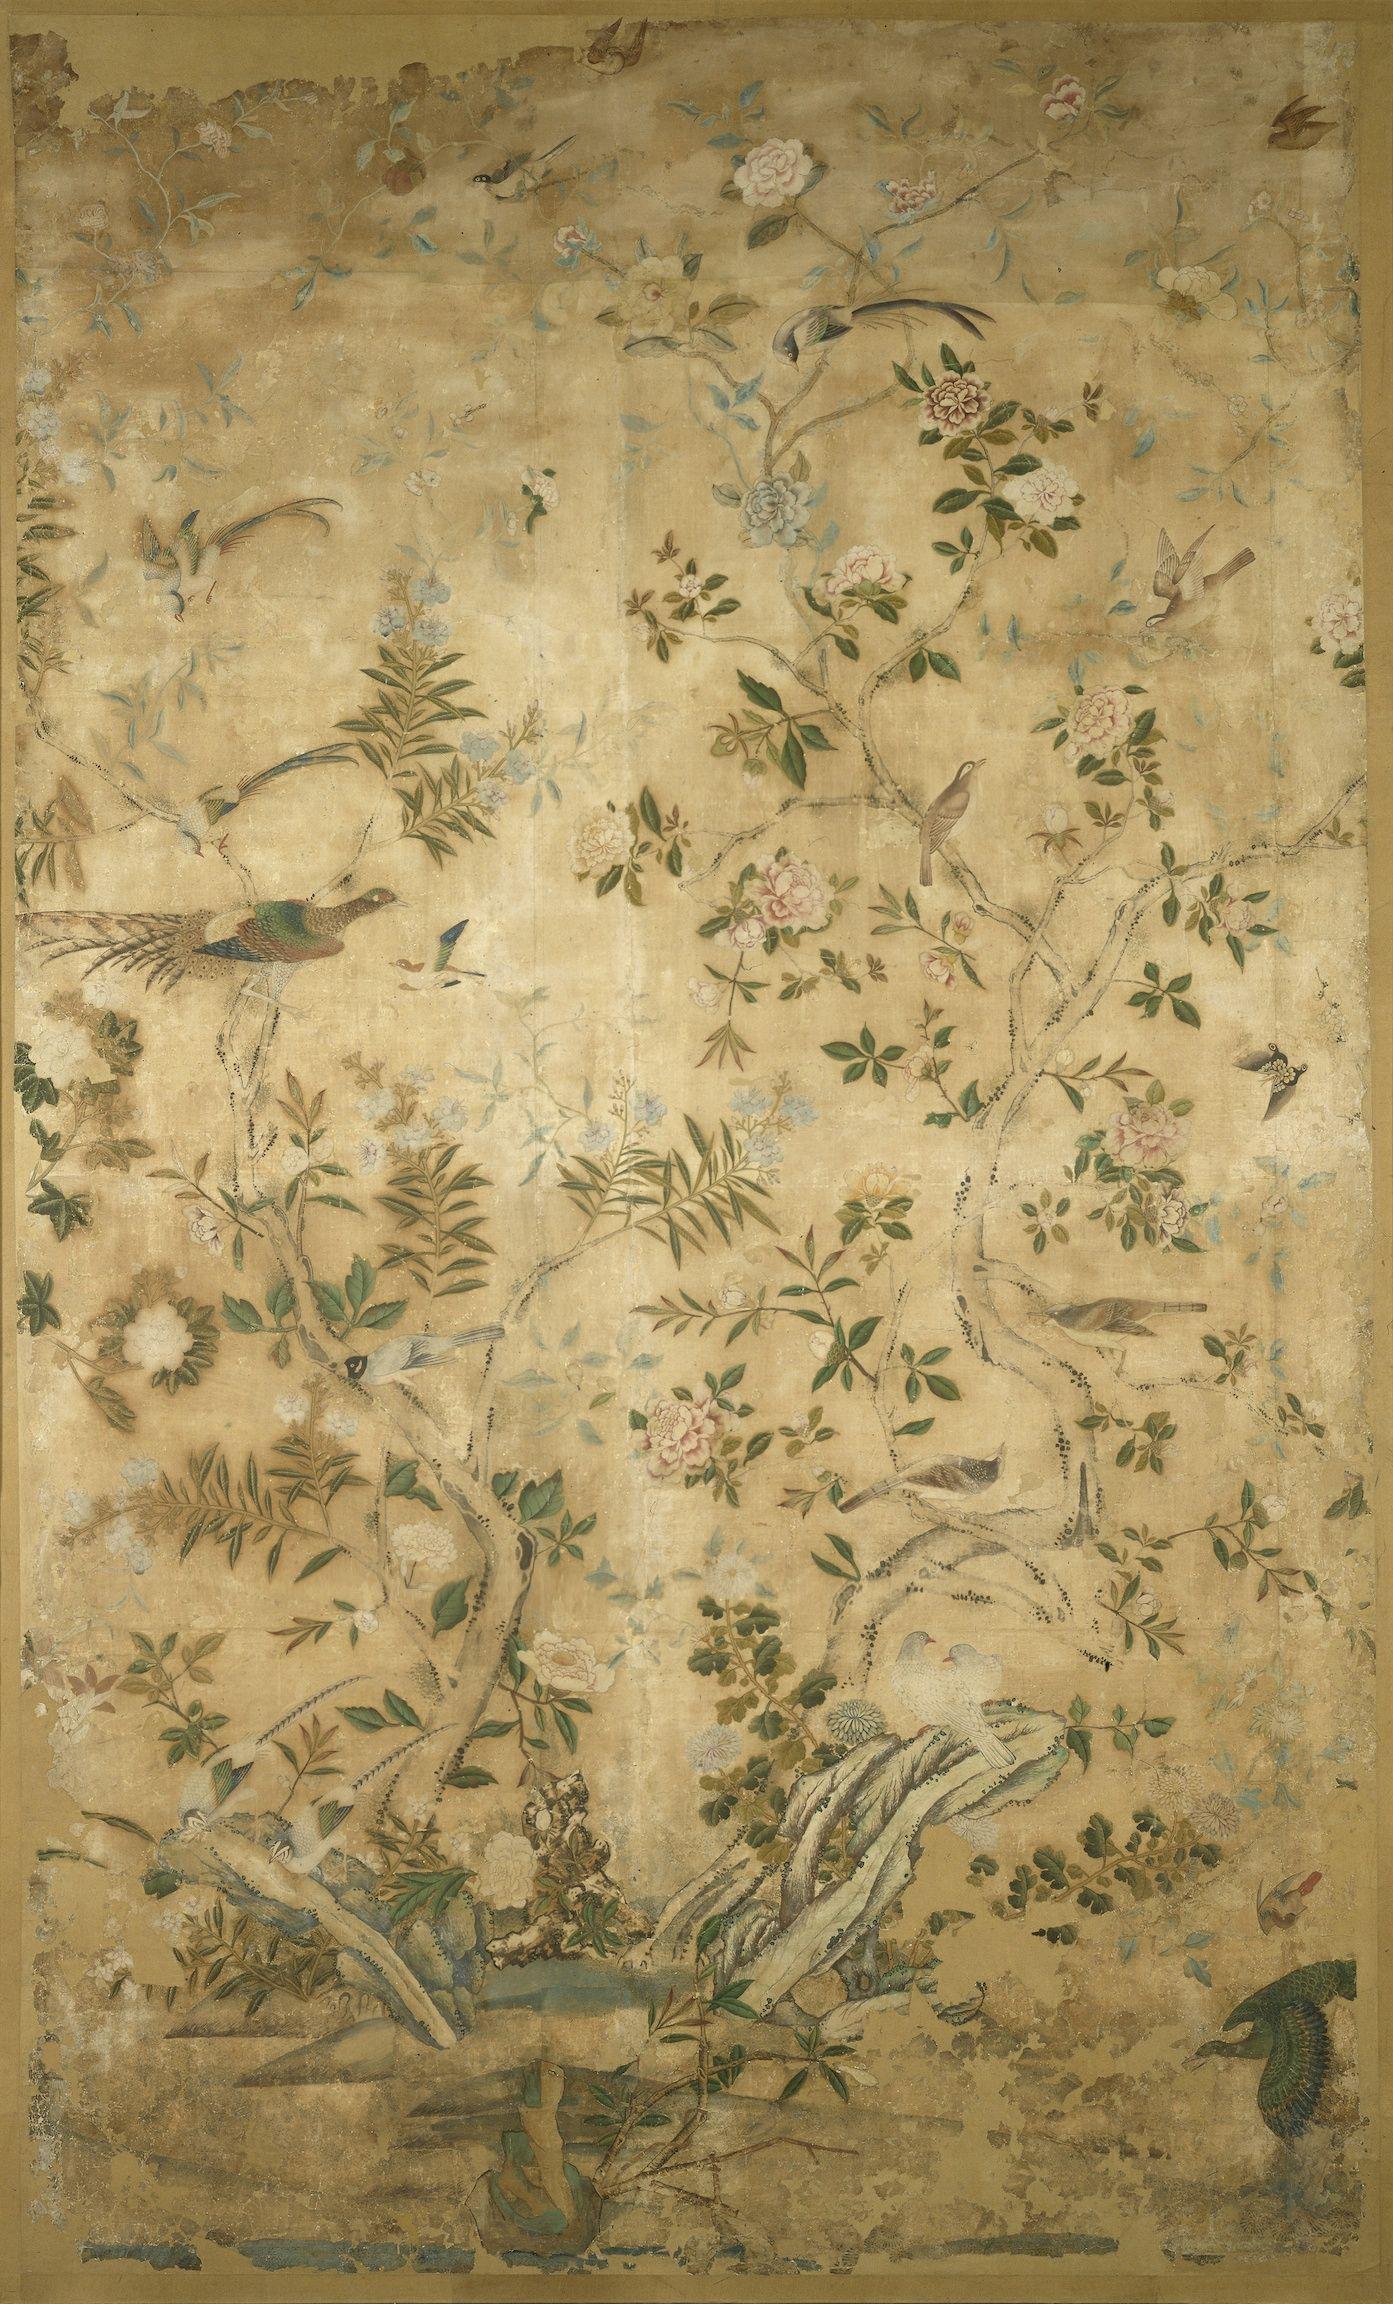 Wallpaper Mural | Wall murals, Wallpaper and Chinoiserie